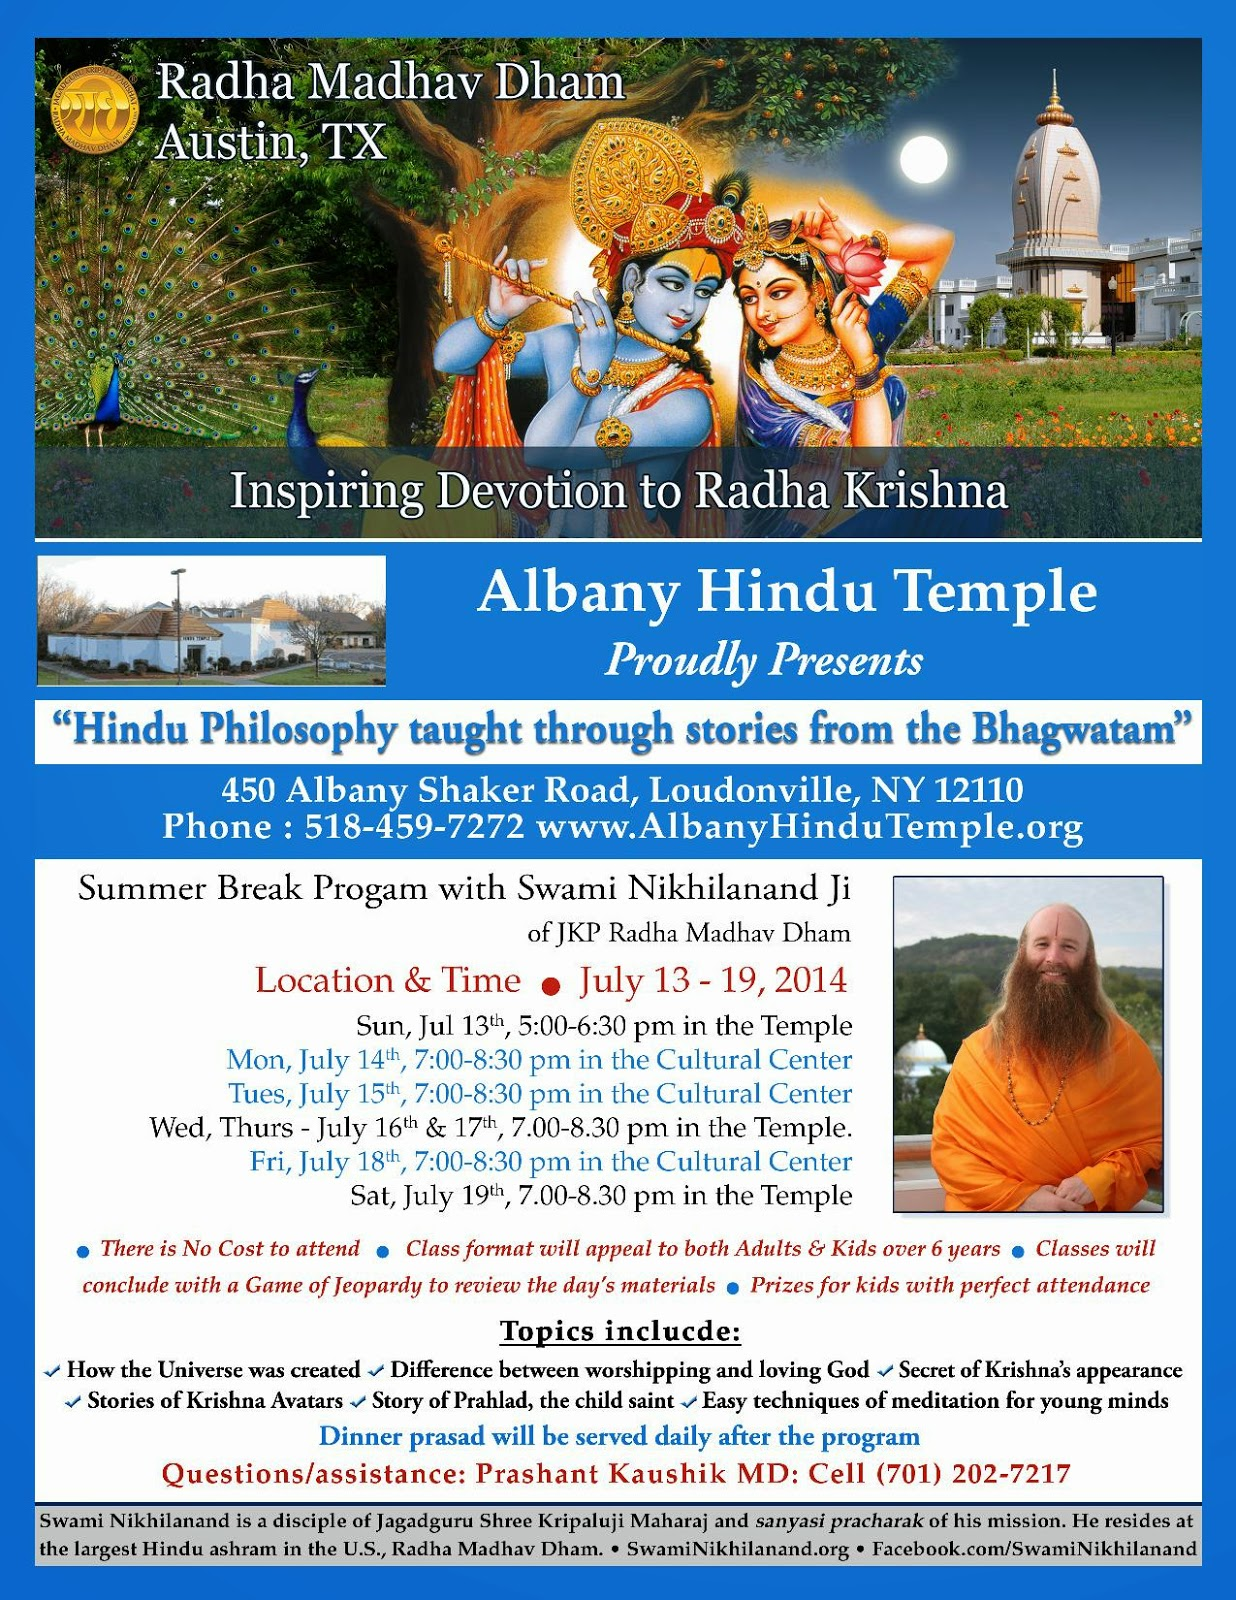 Bhagwatam Hindu Kids class with Swami Nikhilanand, pracharak of Jagadguru Kripaluji Maharaj